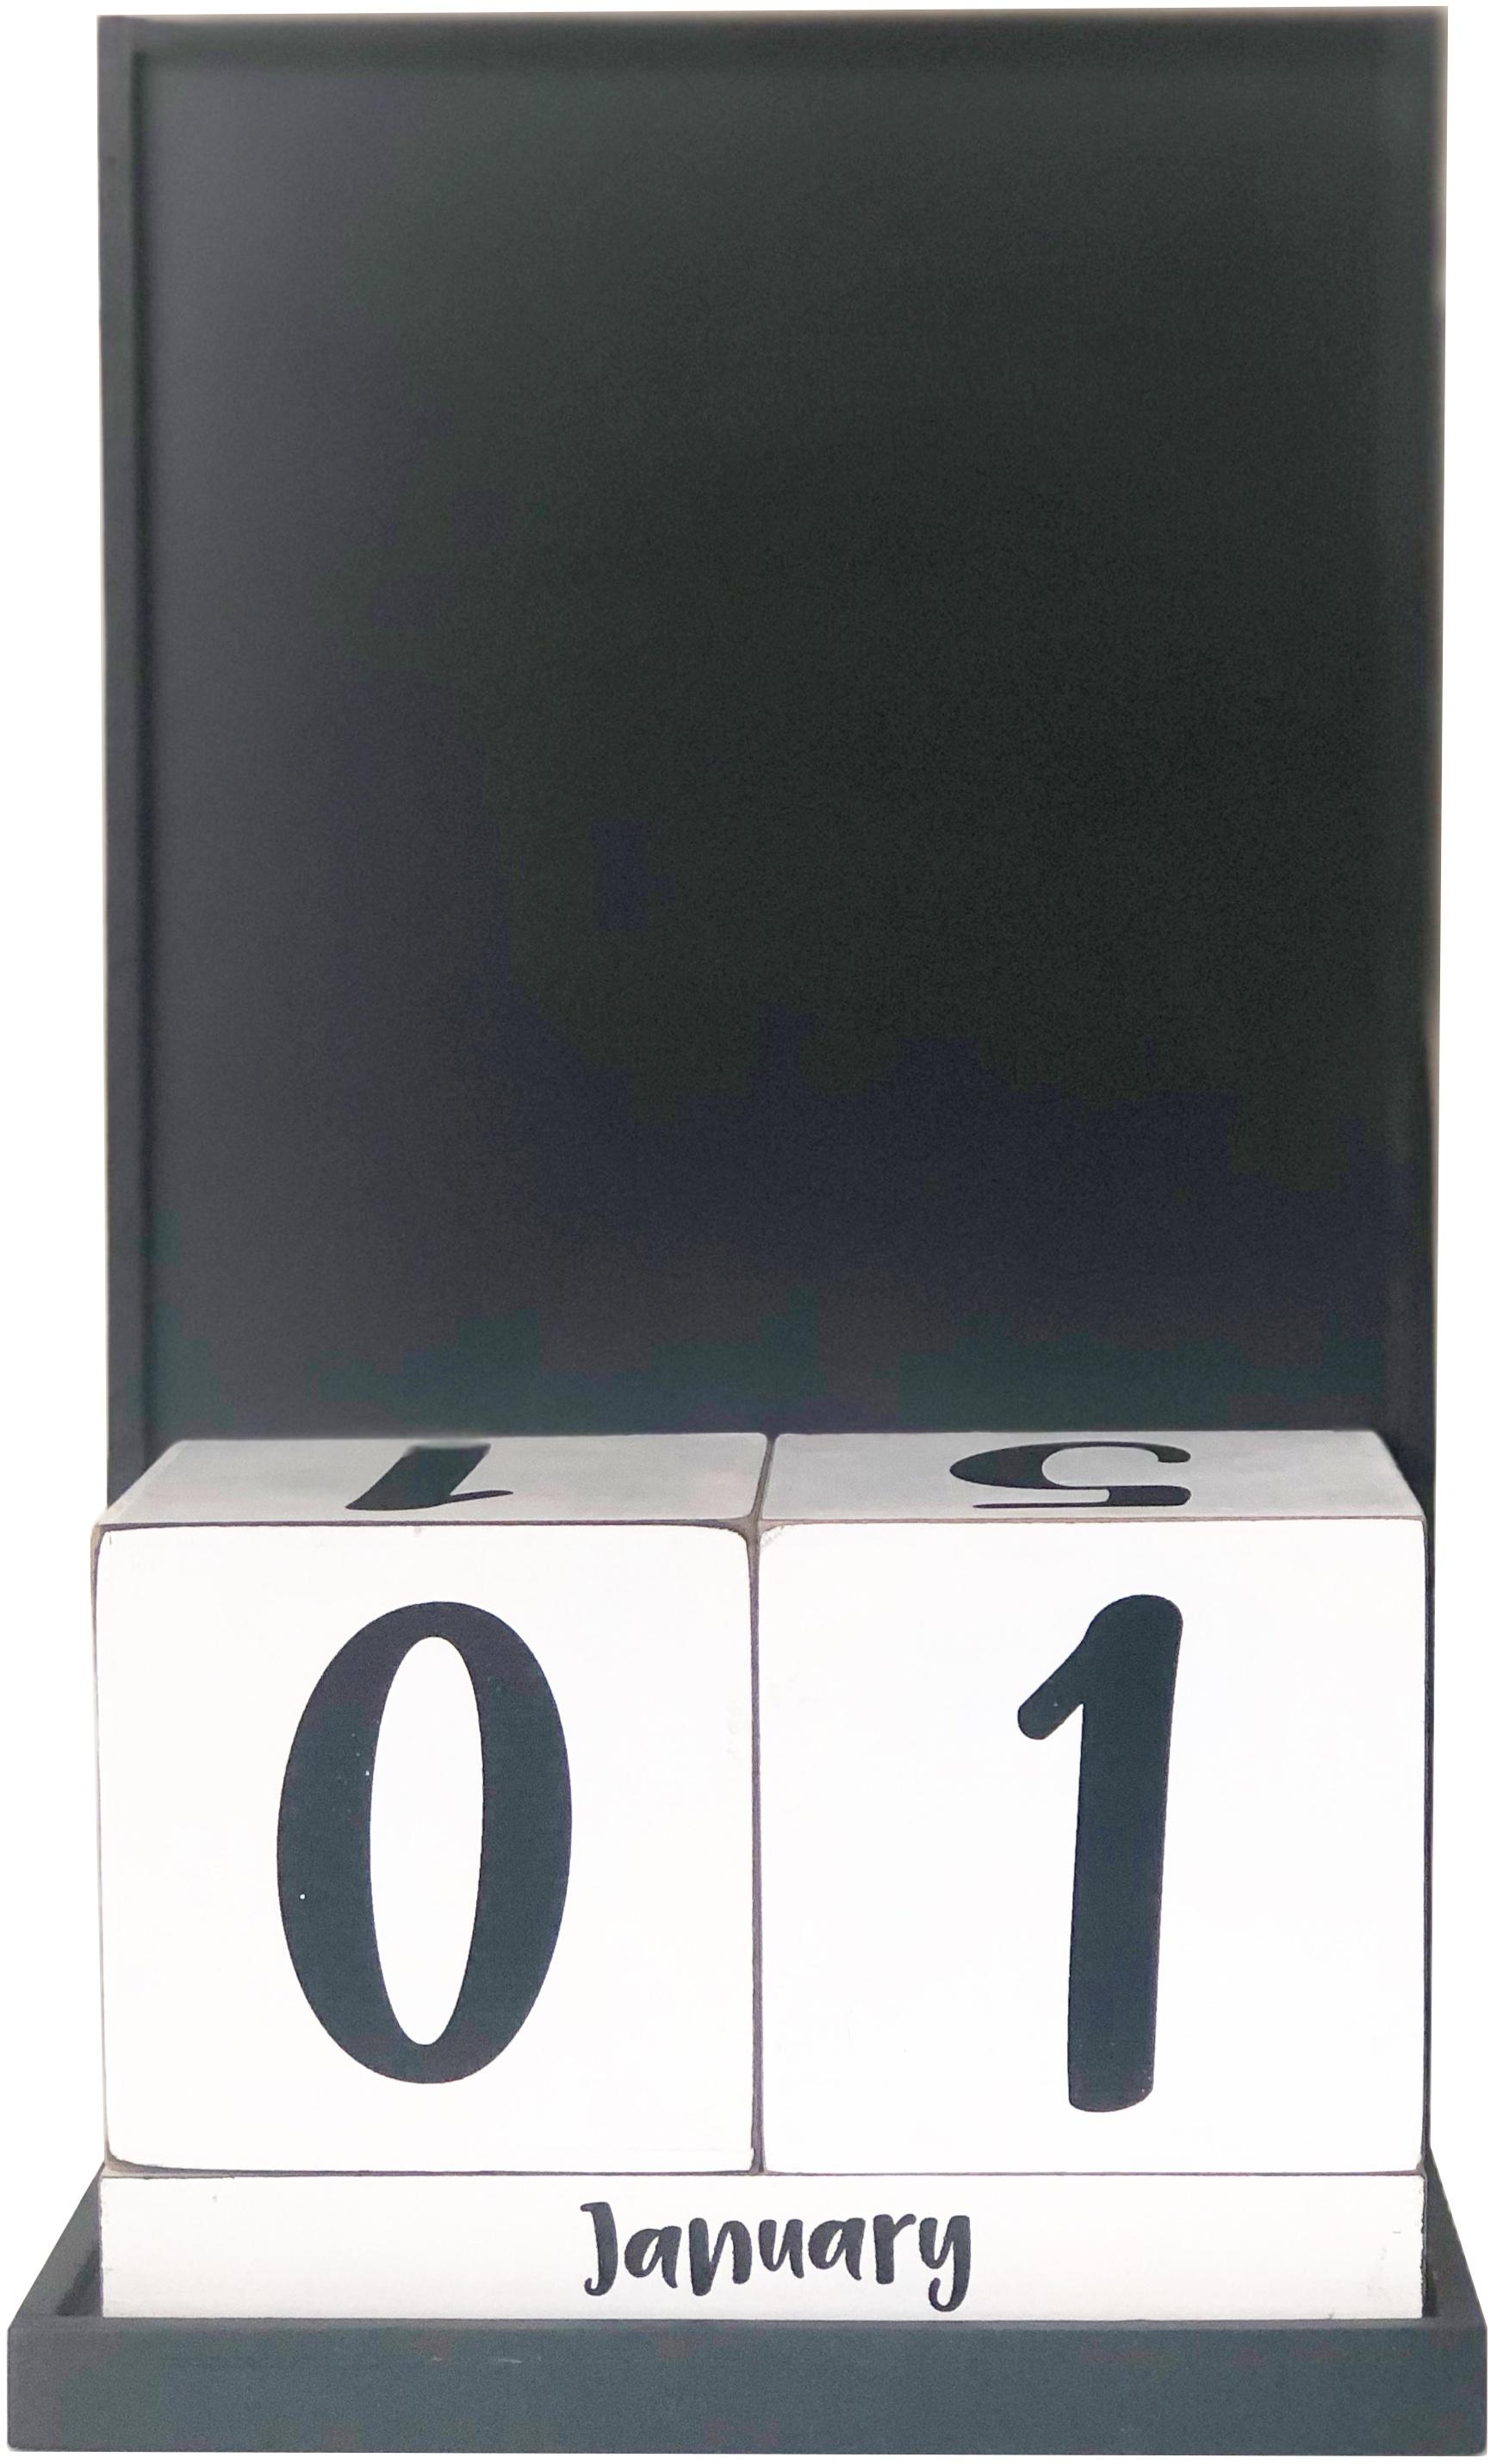 Foundations Decor Magnetic Block Countdown Calendar-Base- PREORDER